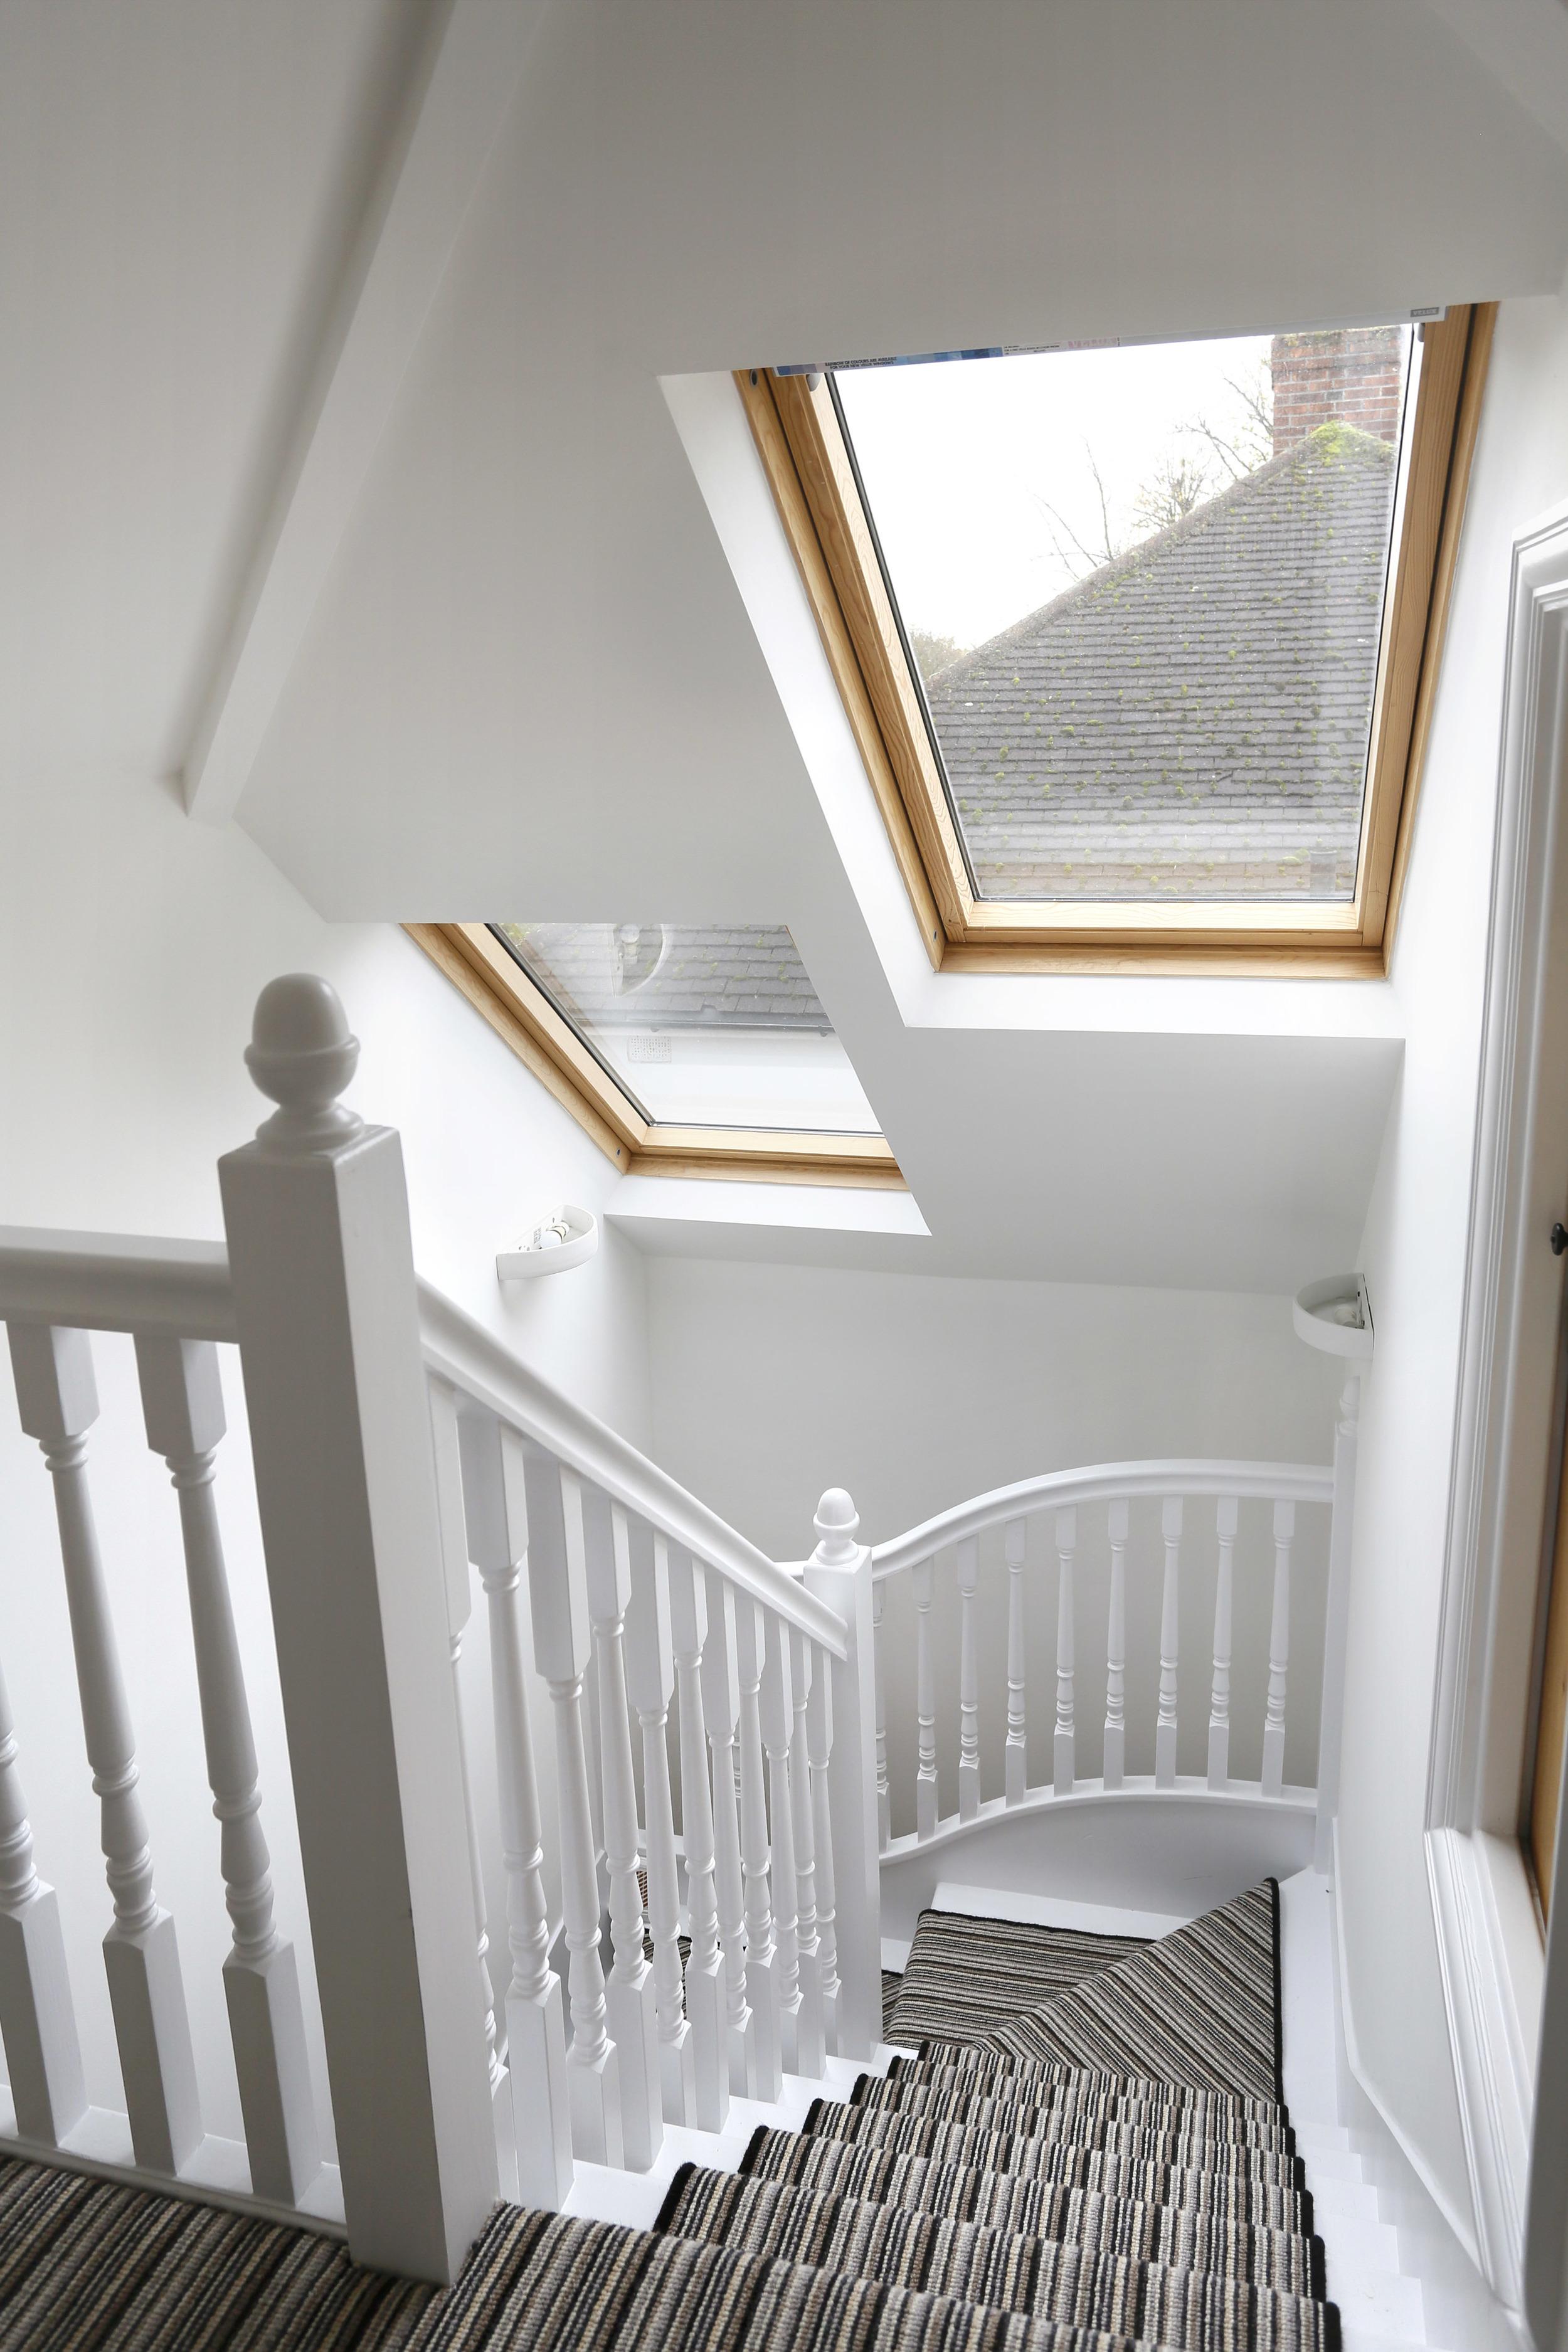 Coombe Lane 241 - Stairs.jpg